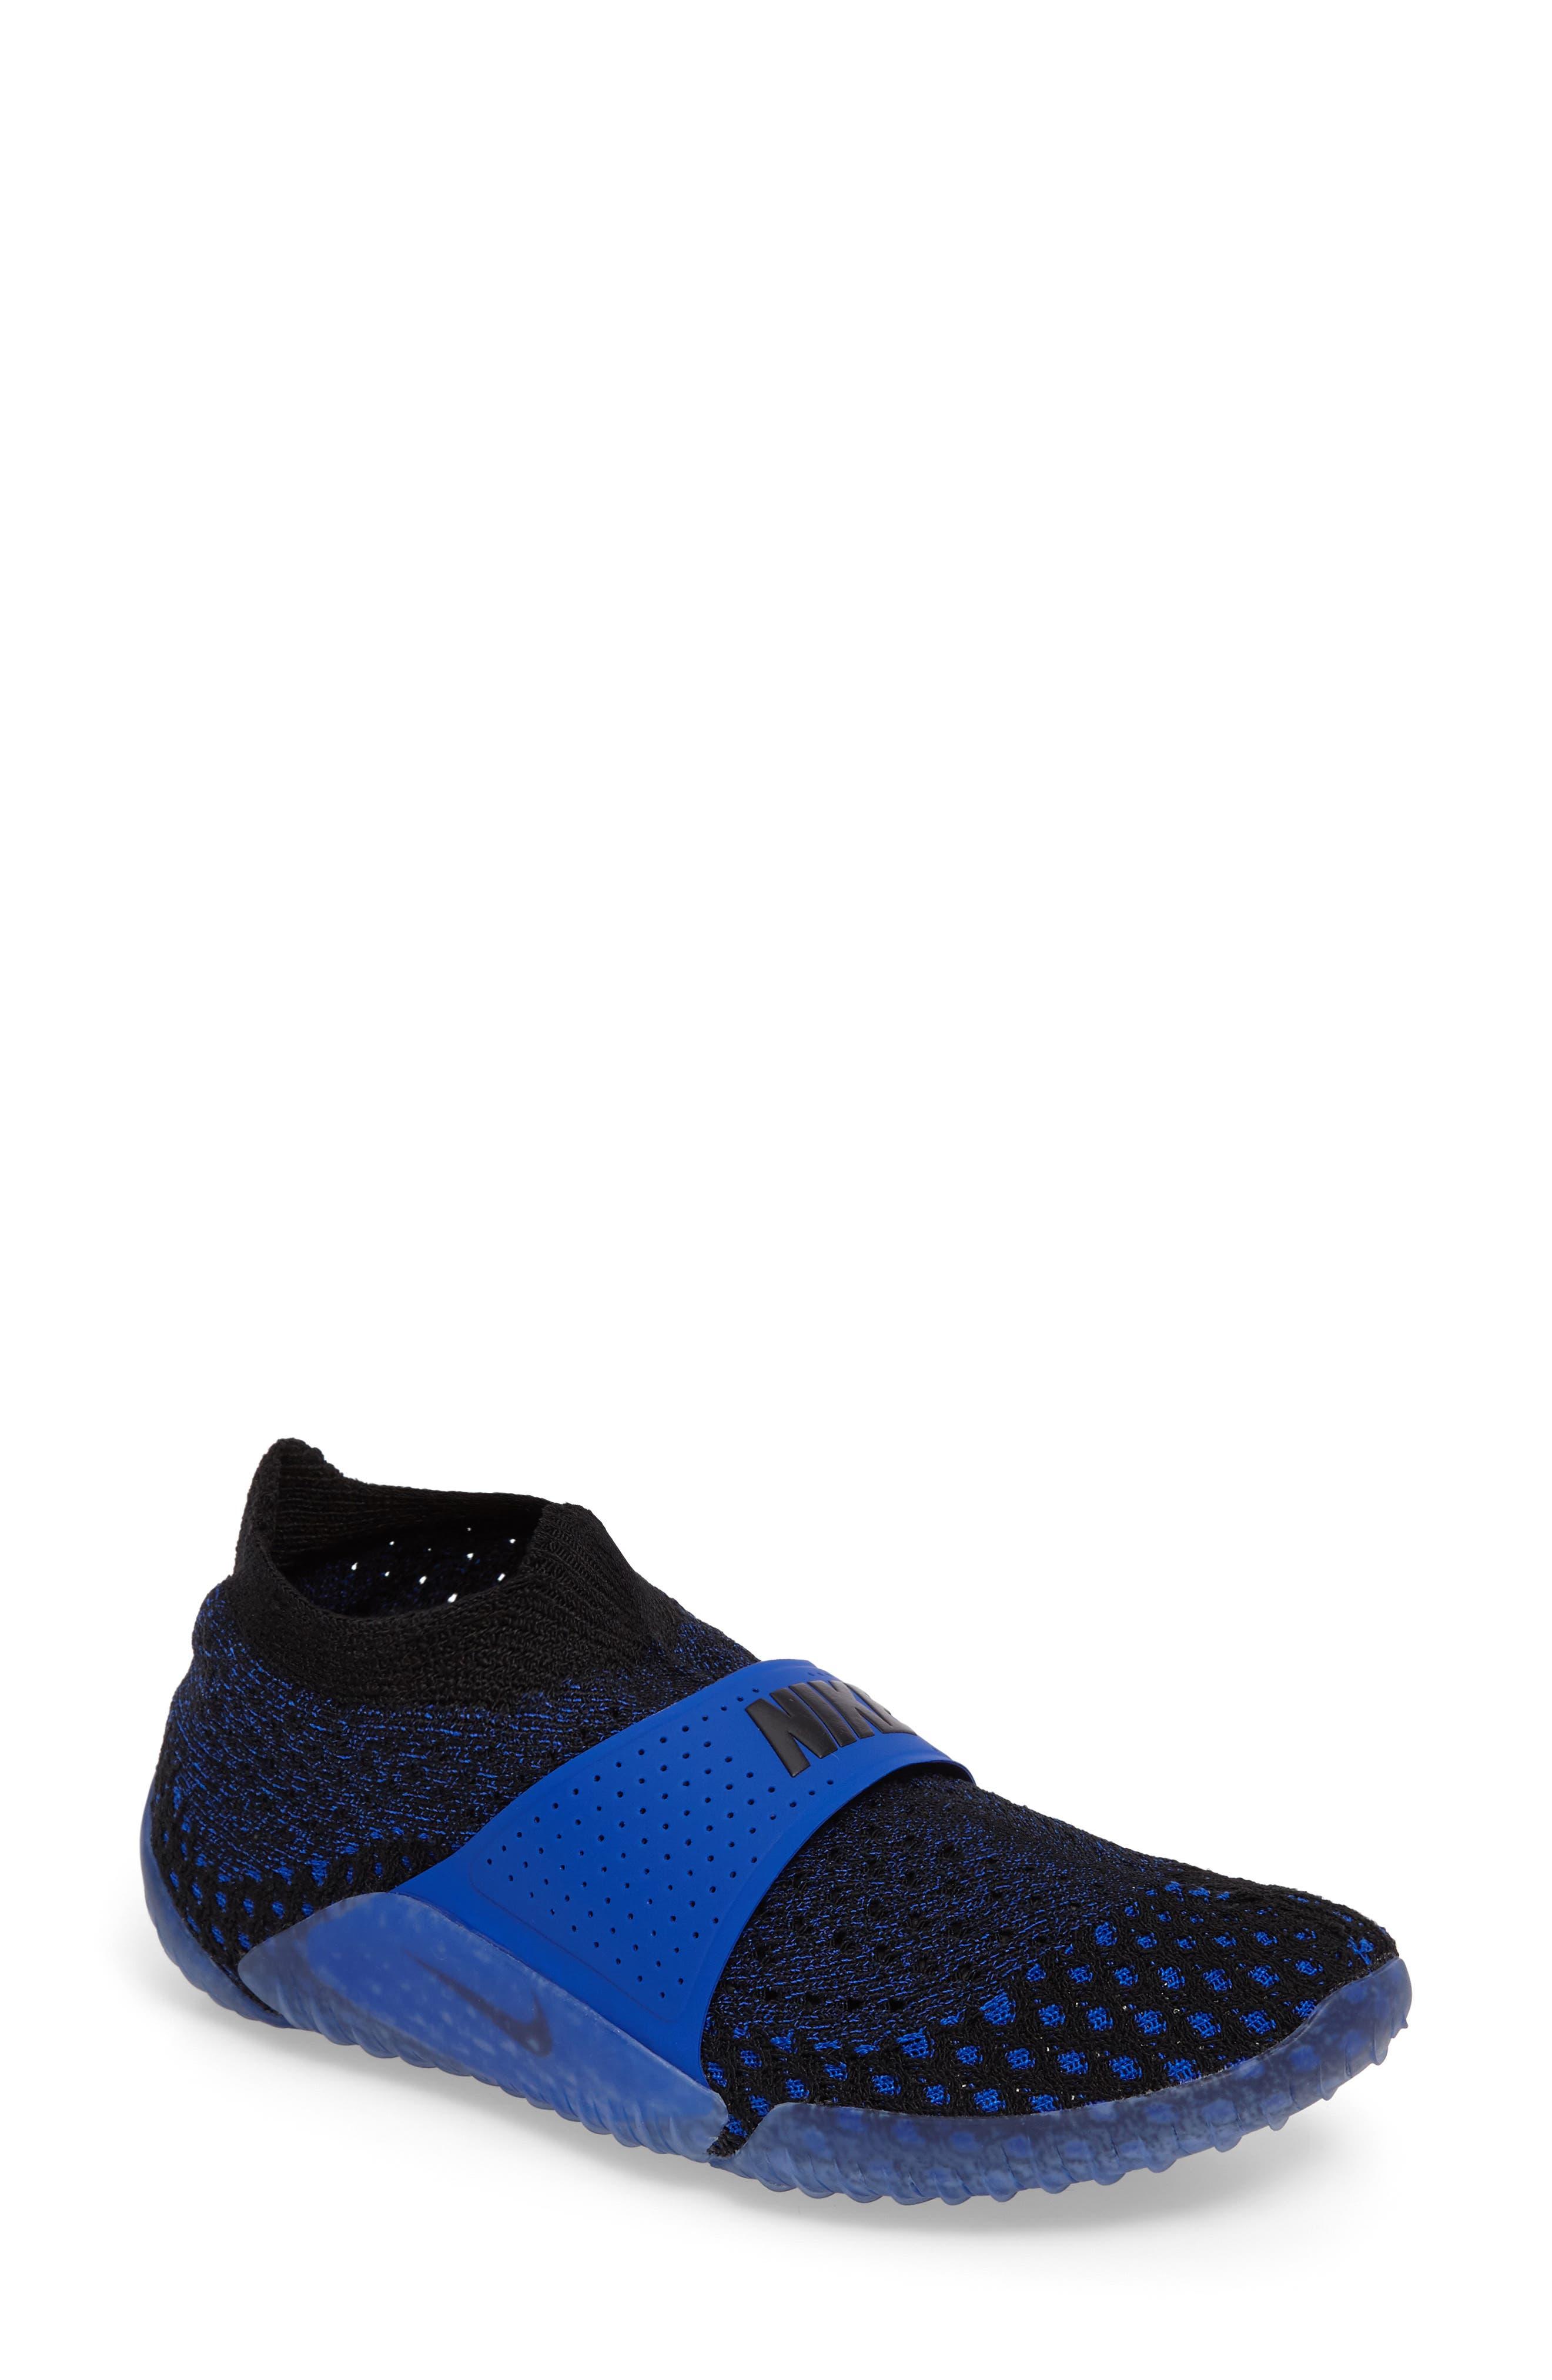 City Knife 3 Flyknit Sneaker,                             Main thumbnail 1, color,                             Racer Blue/ Black/ Black